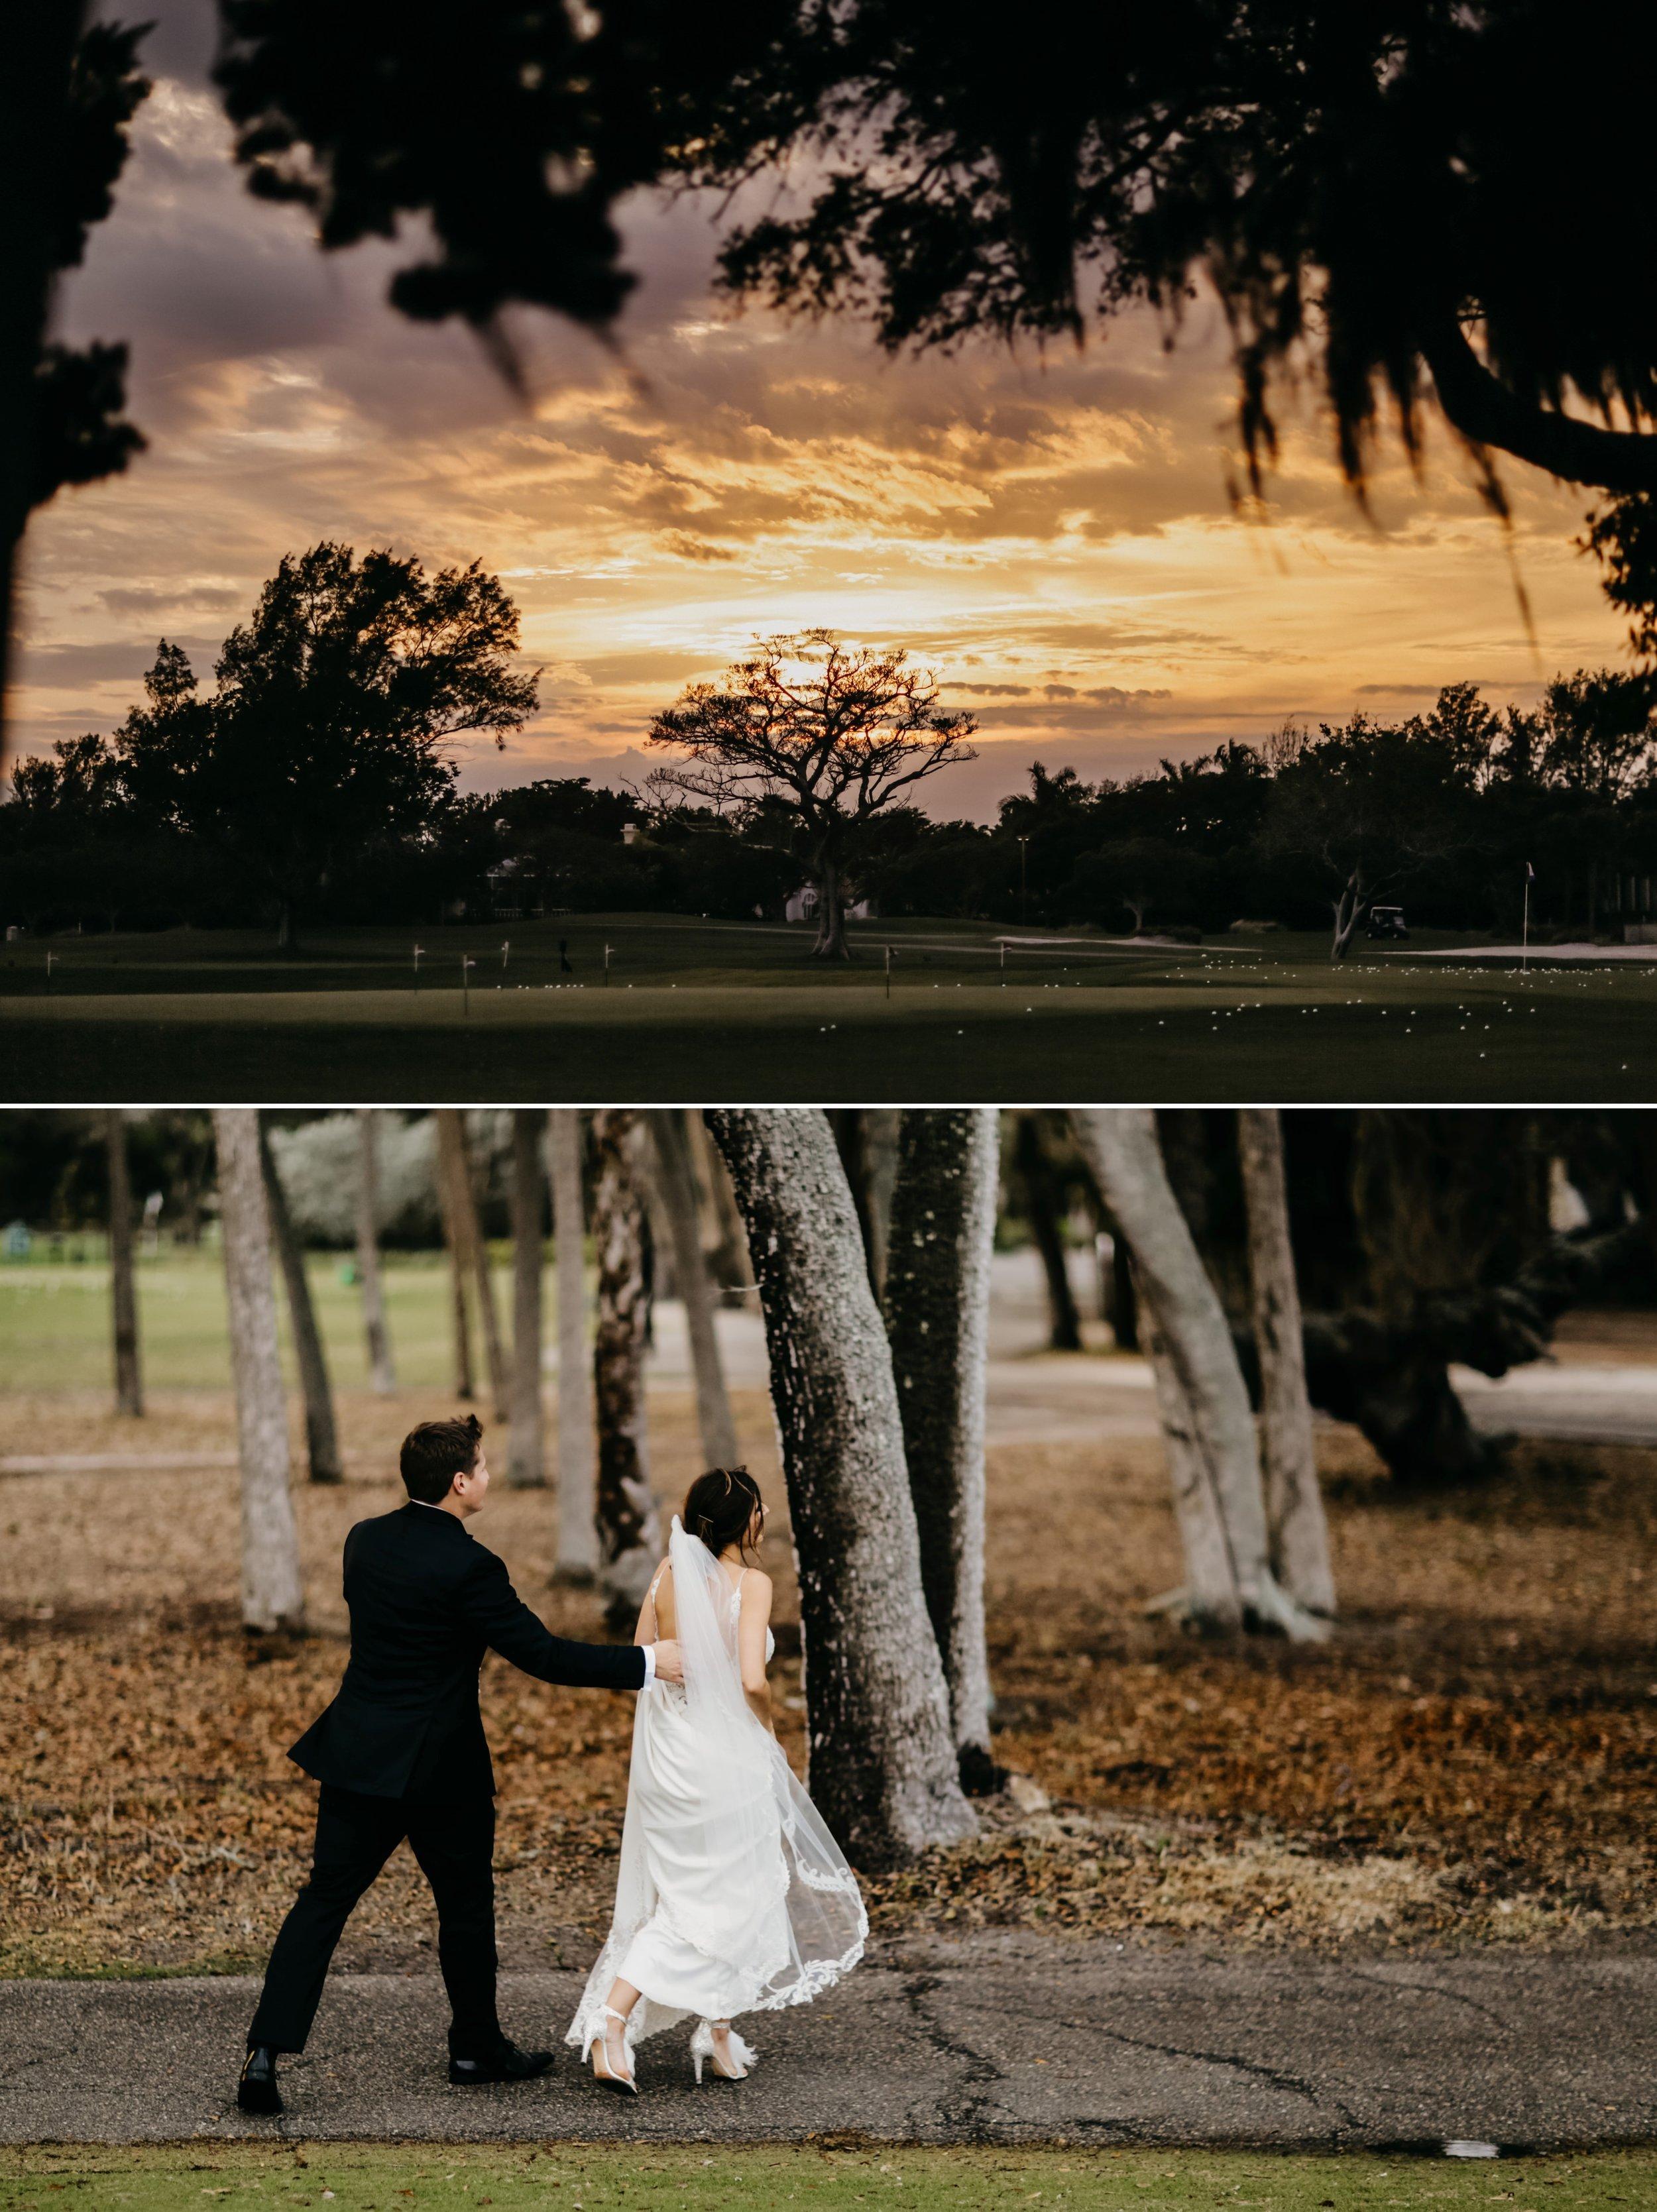 Luxe_tropical_travel_destination_wedding_photography_ShainaDeCiryan.com23.jpg